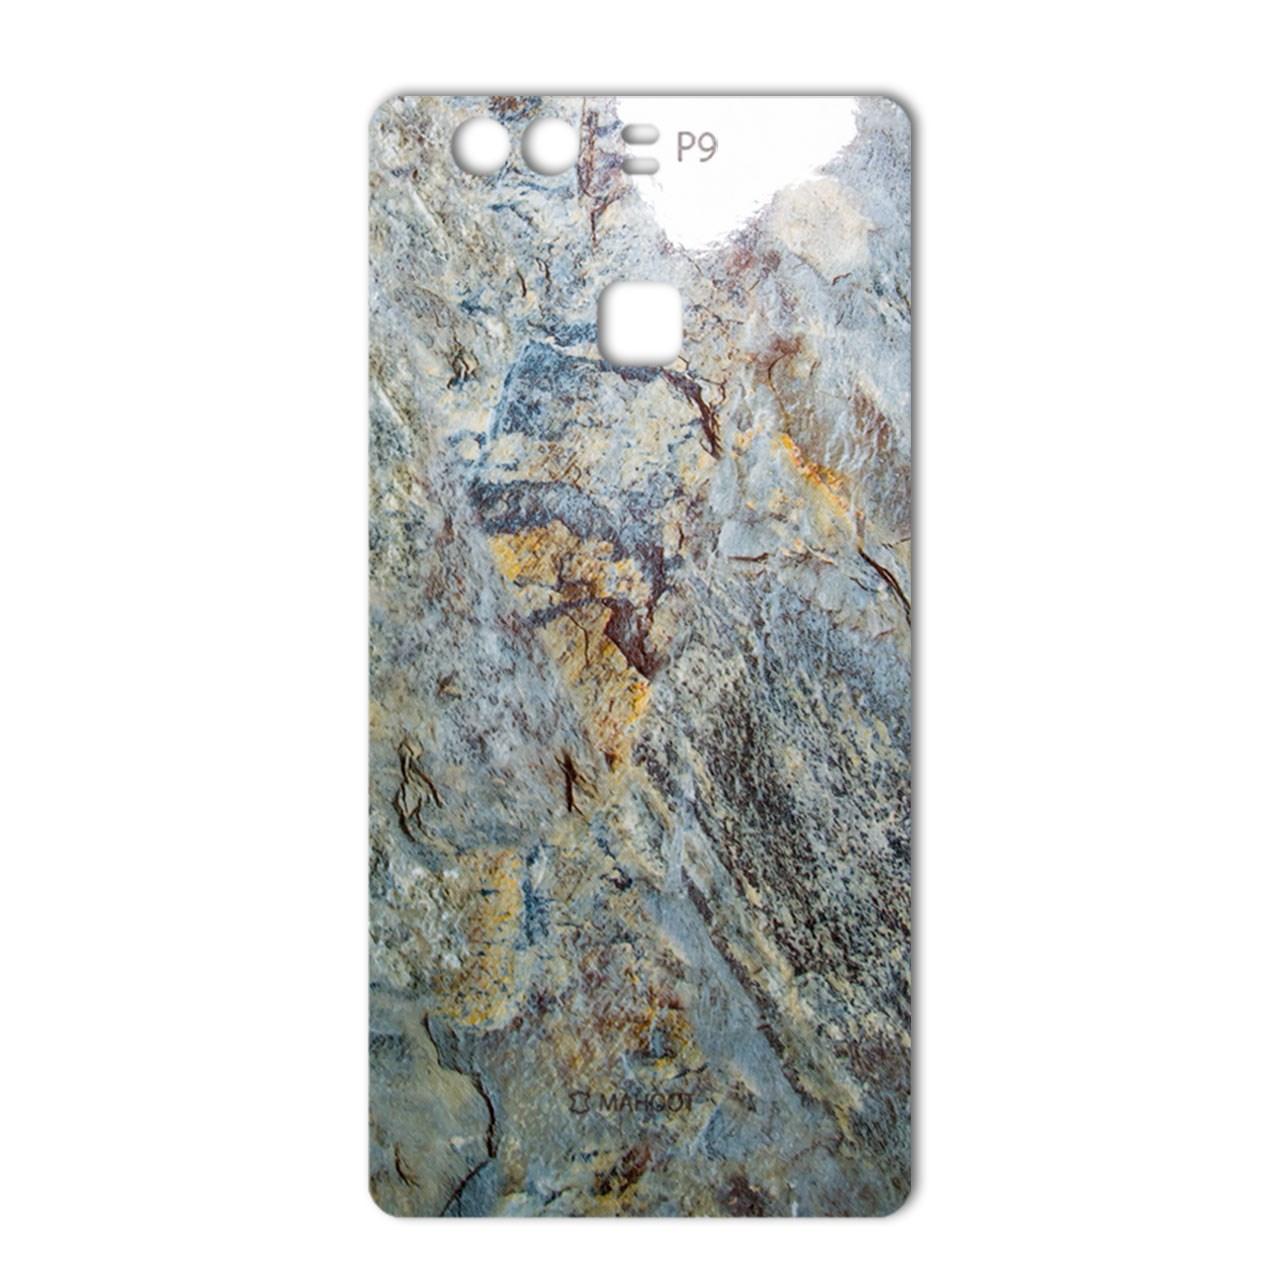 برچسب پوششی ماهوت مدل Marble-vein-cut Special مناسب برای گوشی  Huawei P9